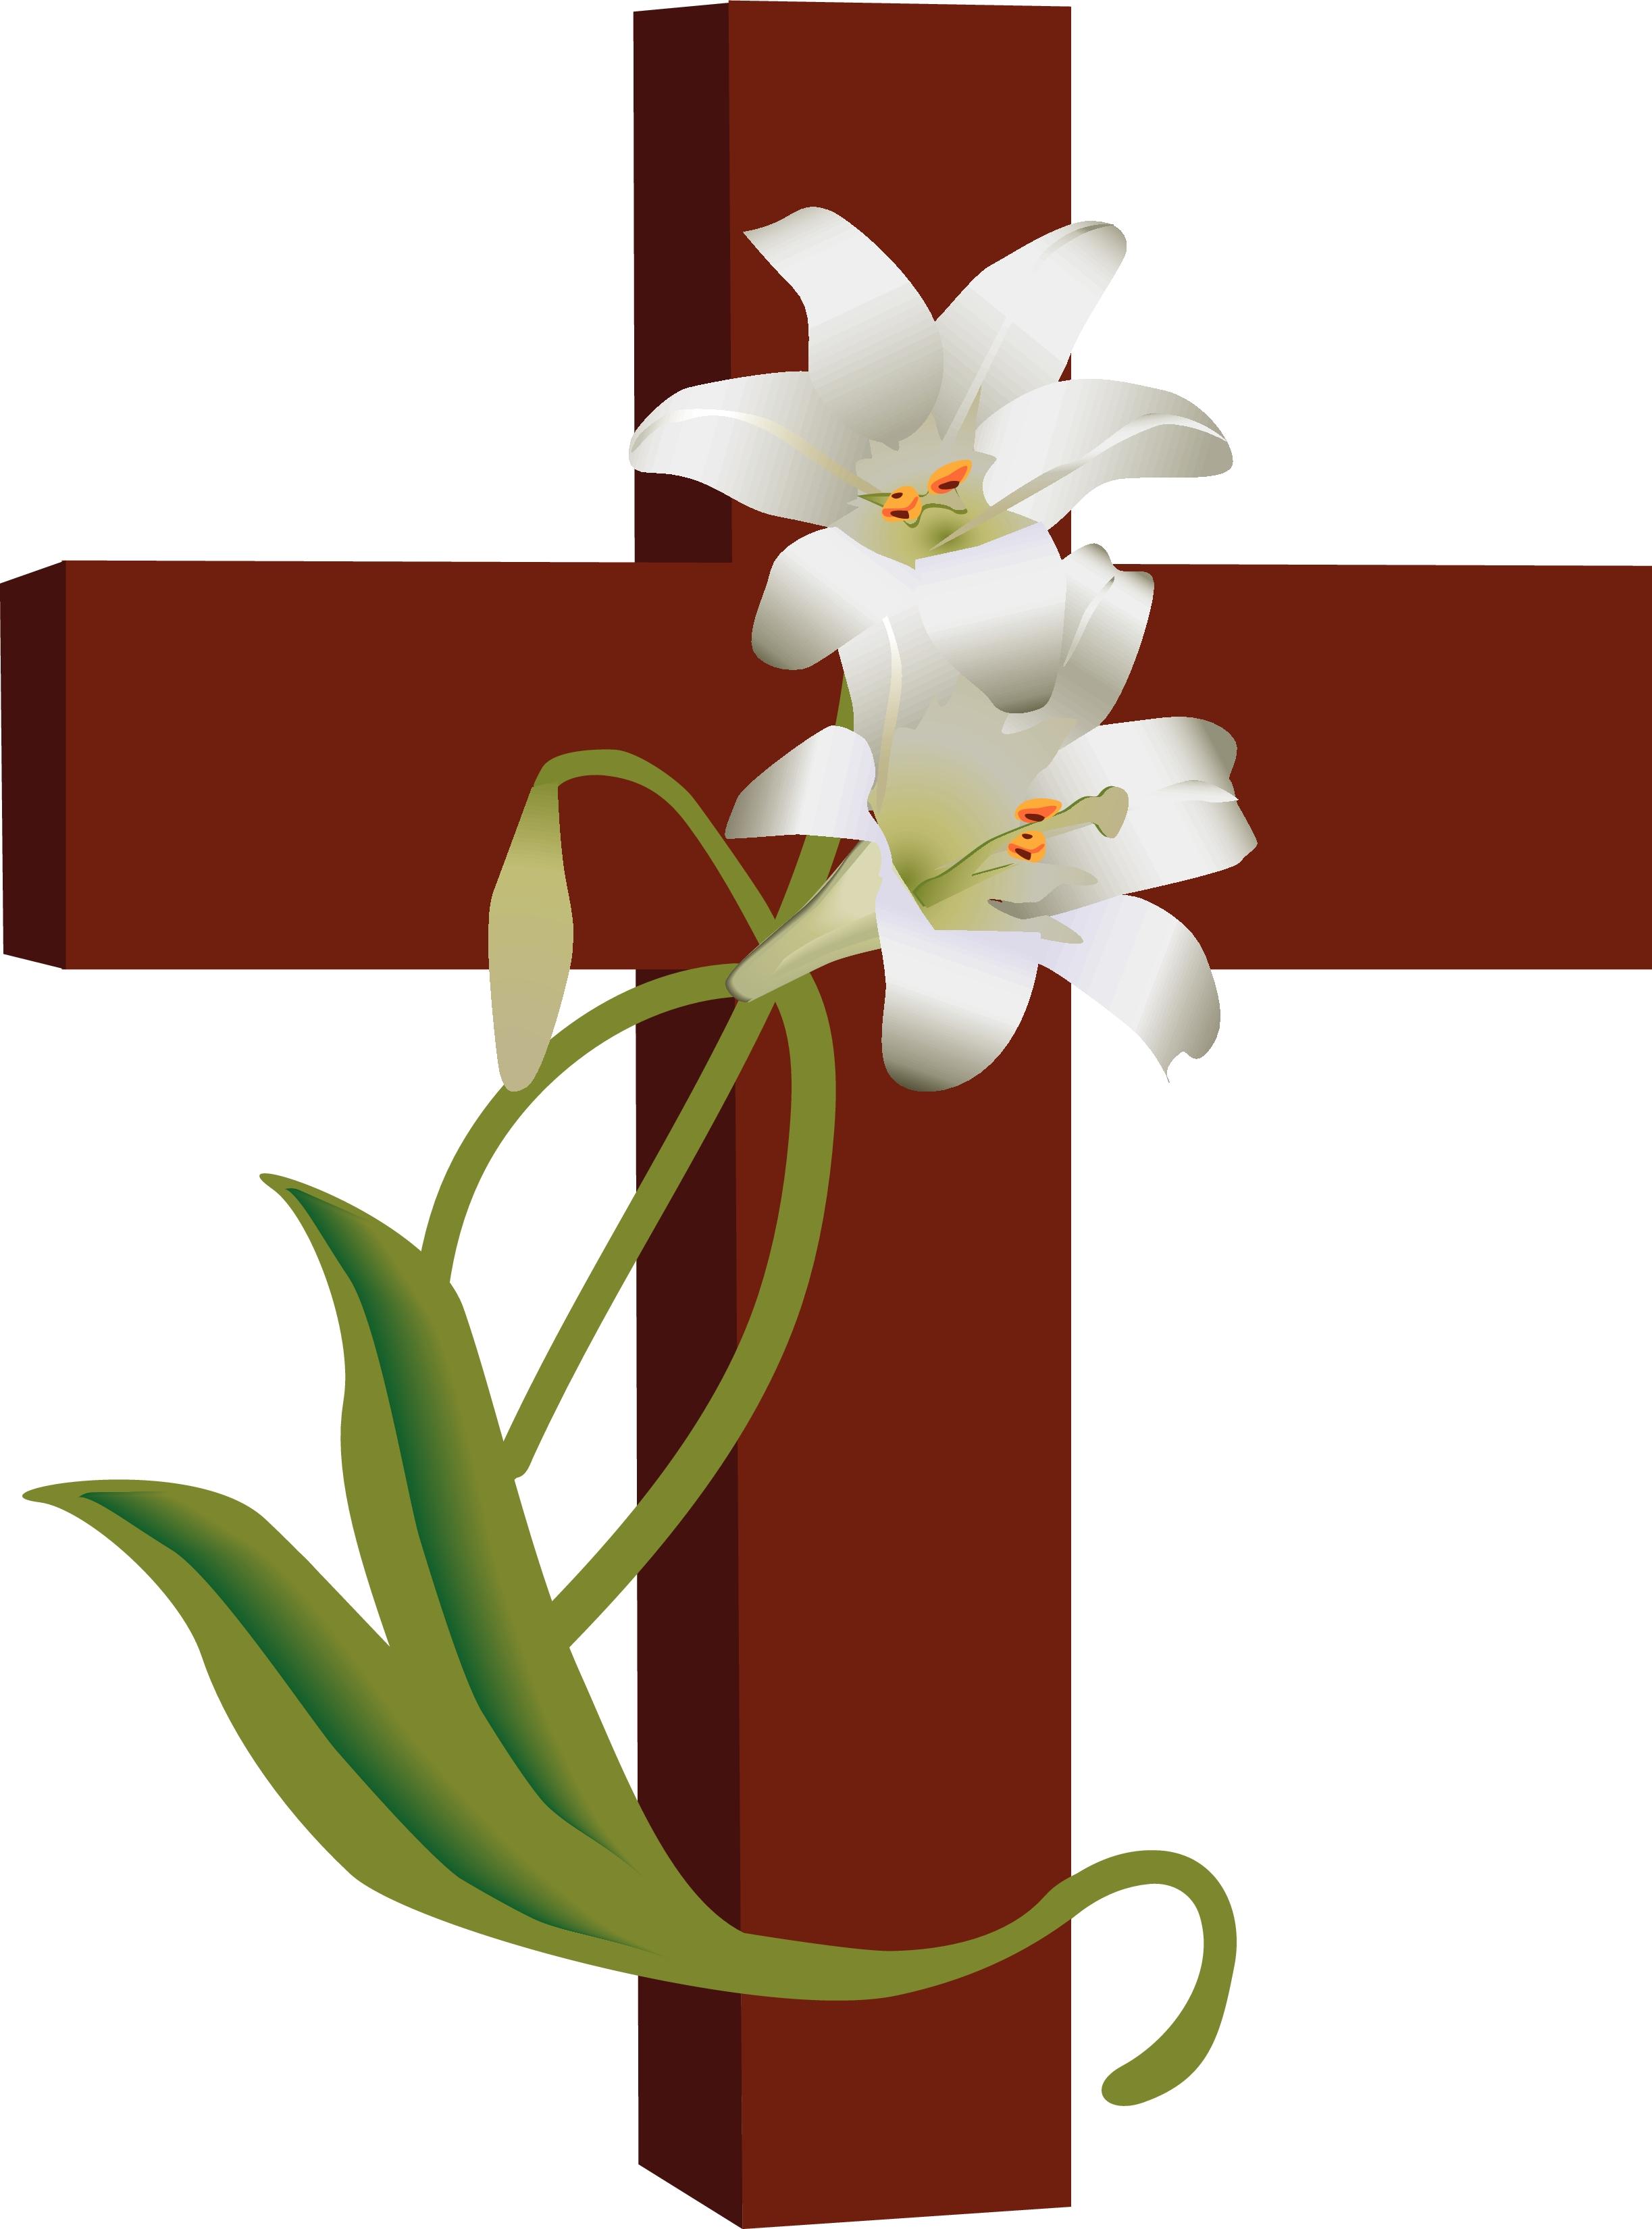 Jesus on the cross clipart